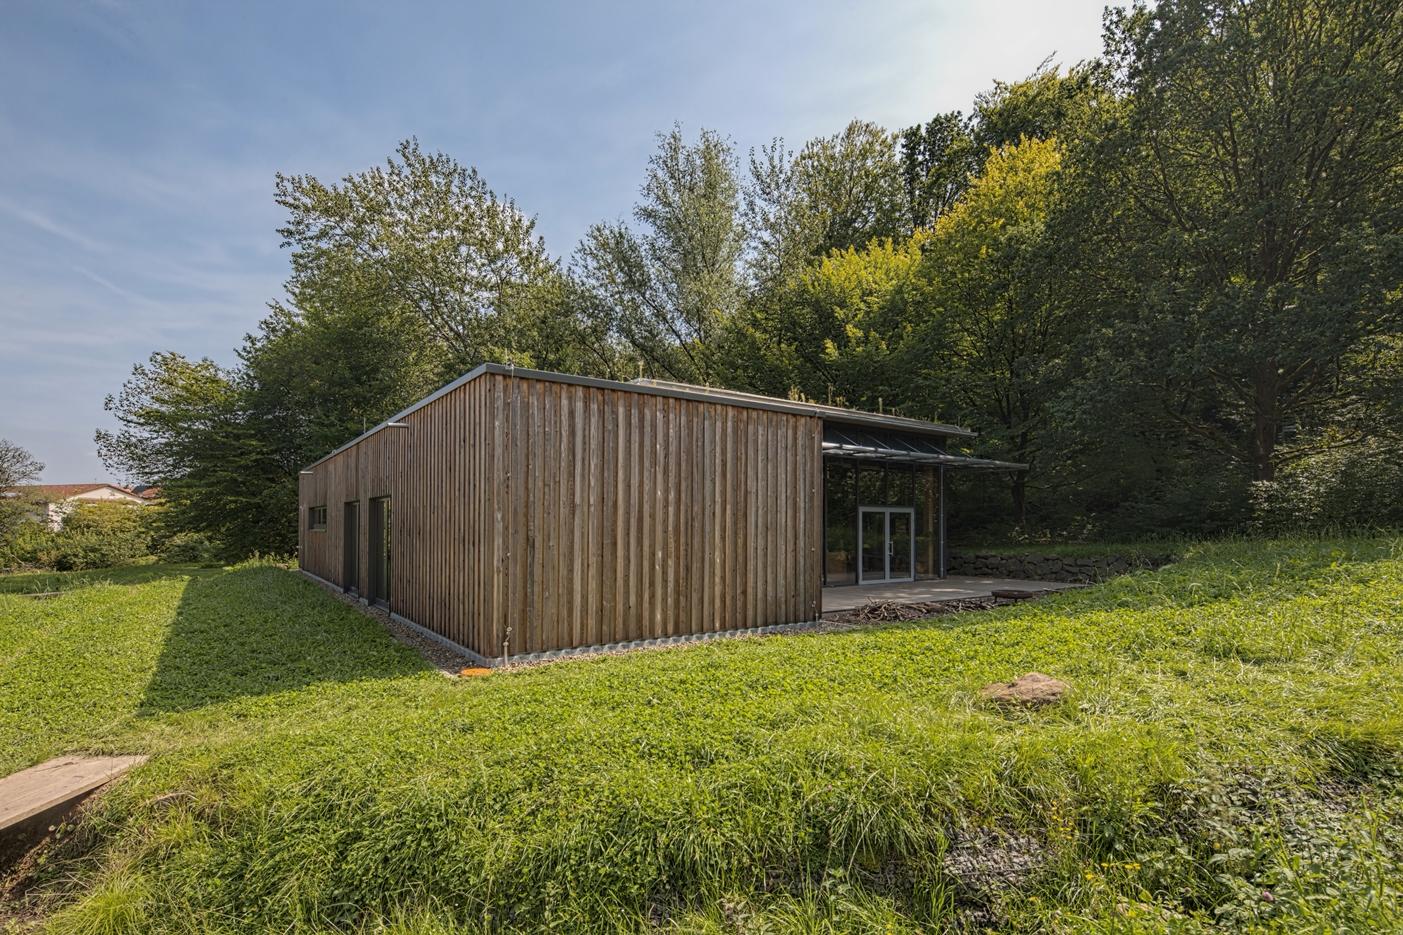 bsj, Bildungshaus Natur, Marburg